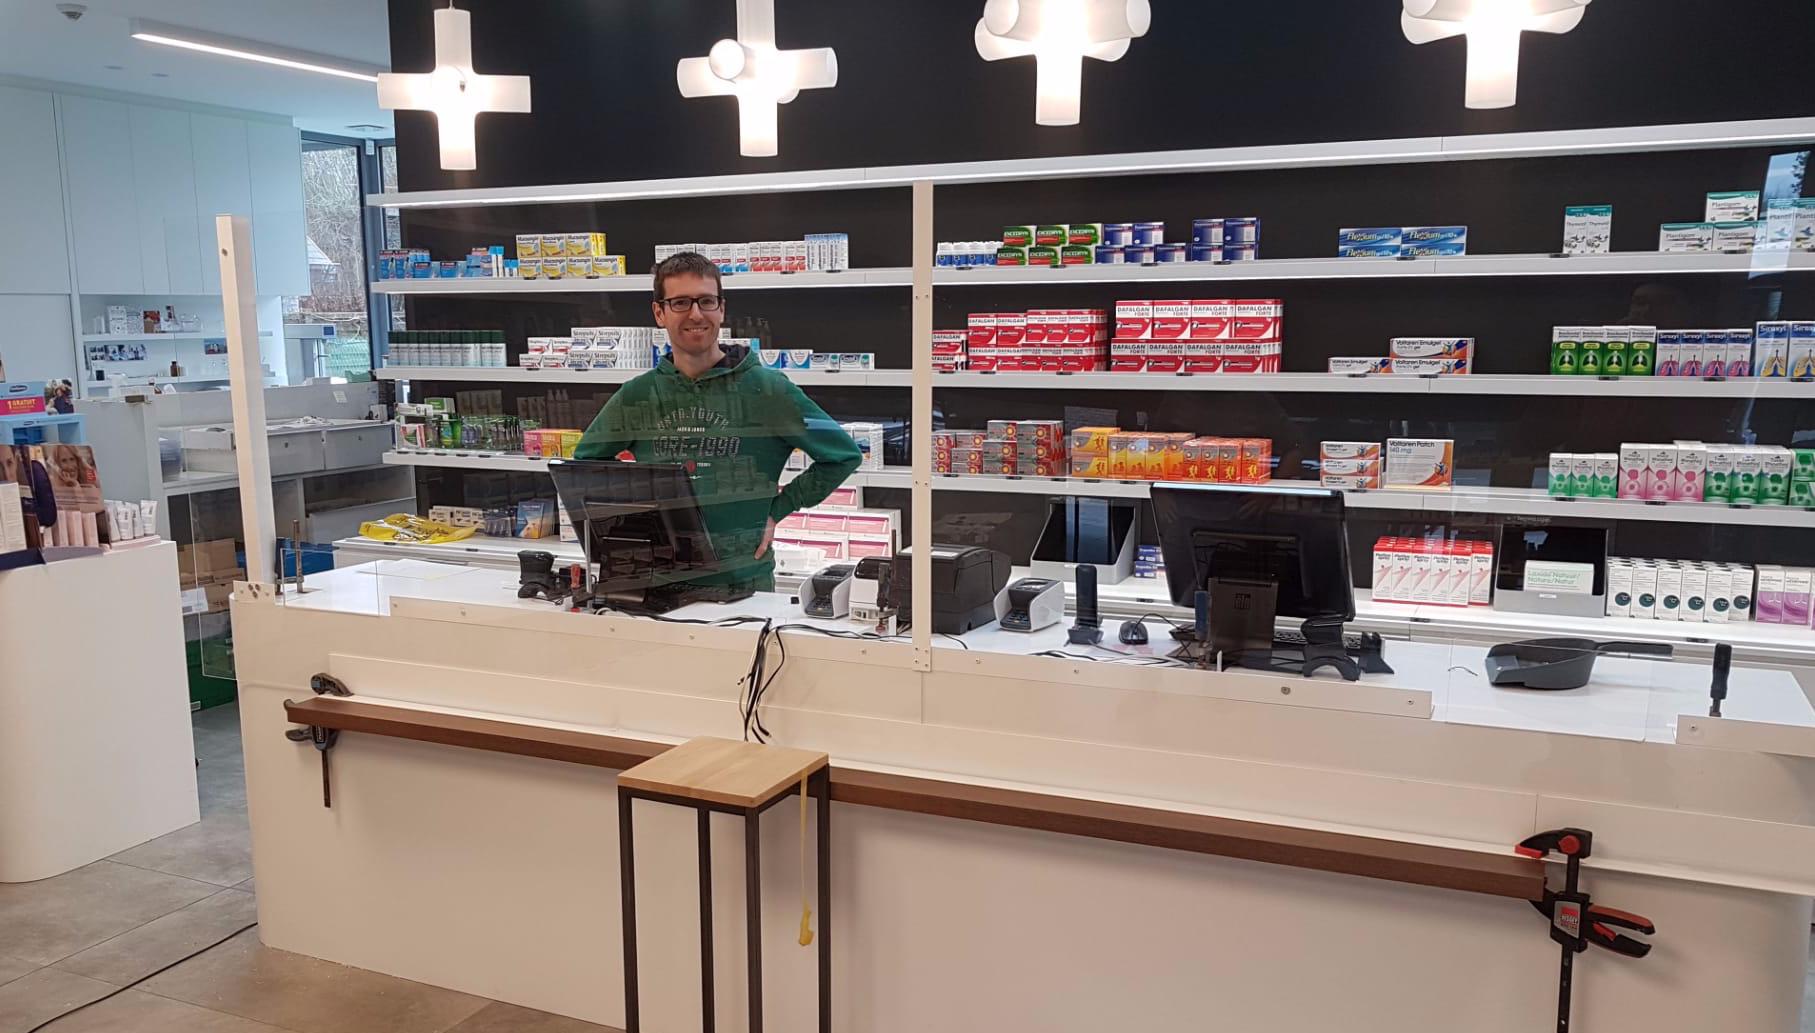 apotheek met plexiglas